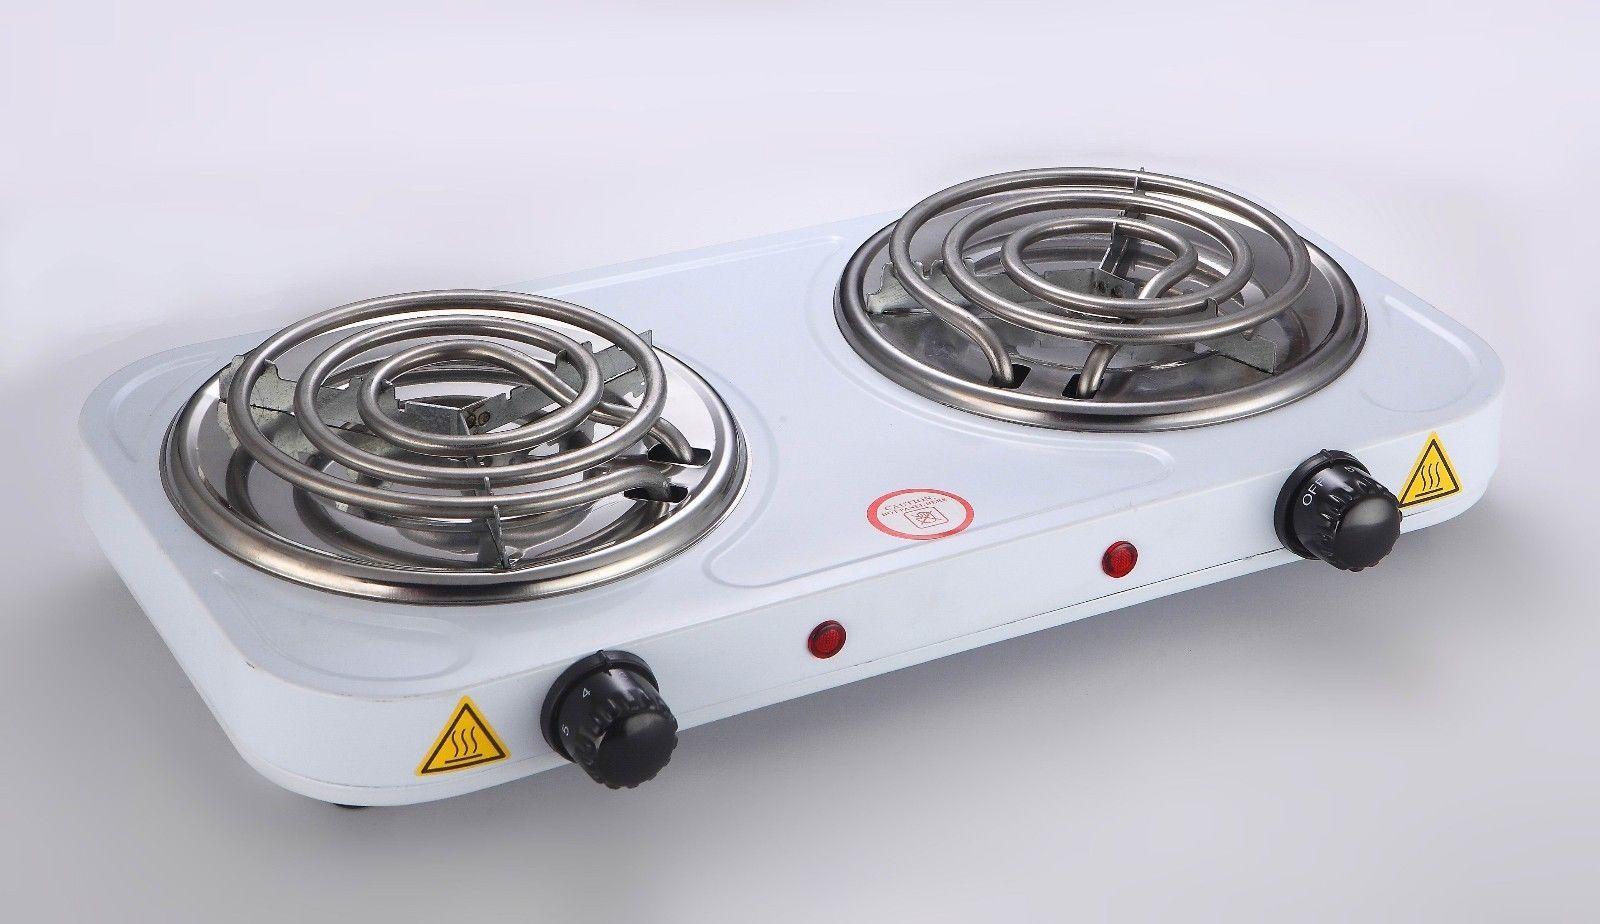 Altocraft Cookmaster Electric Double Burner Portable Hotplates Burners Stove Ebay Burner Stove Hotplates Double Burner